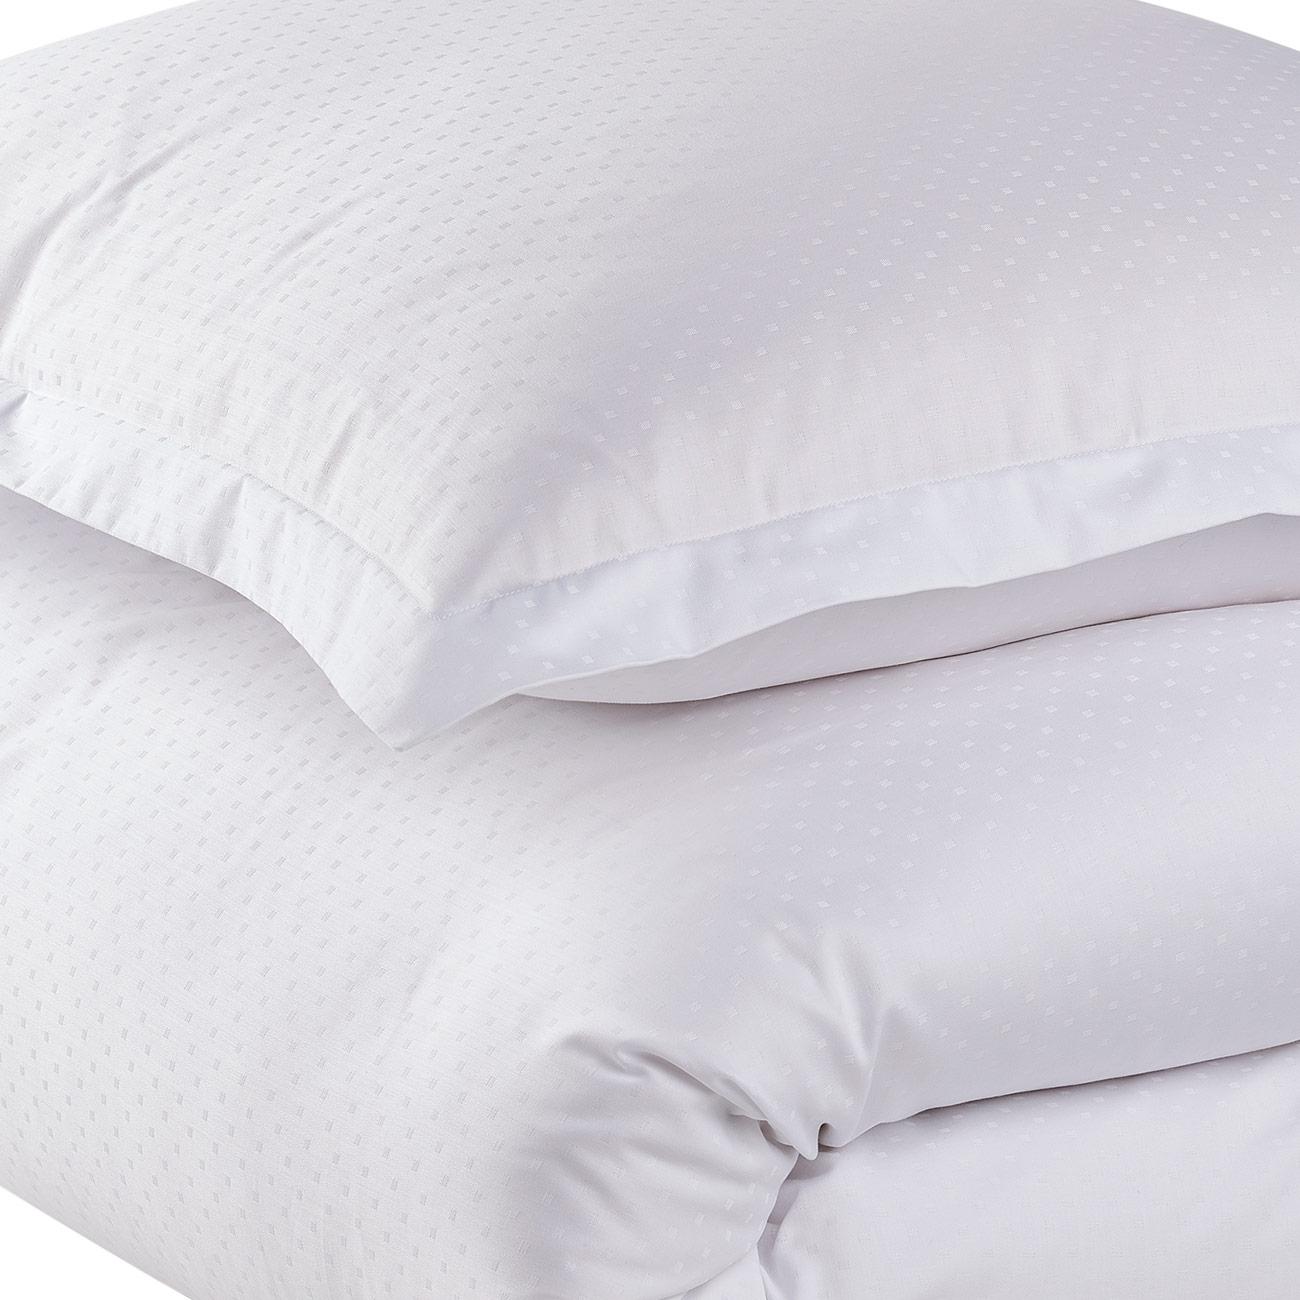 Georg Jensen Damask Bed Linen Northern Light White